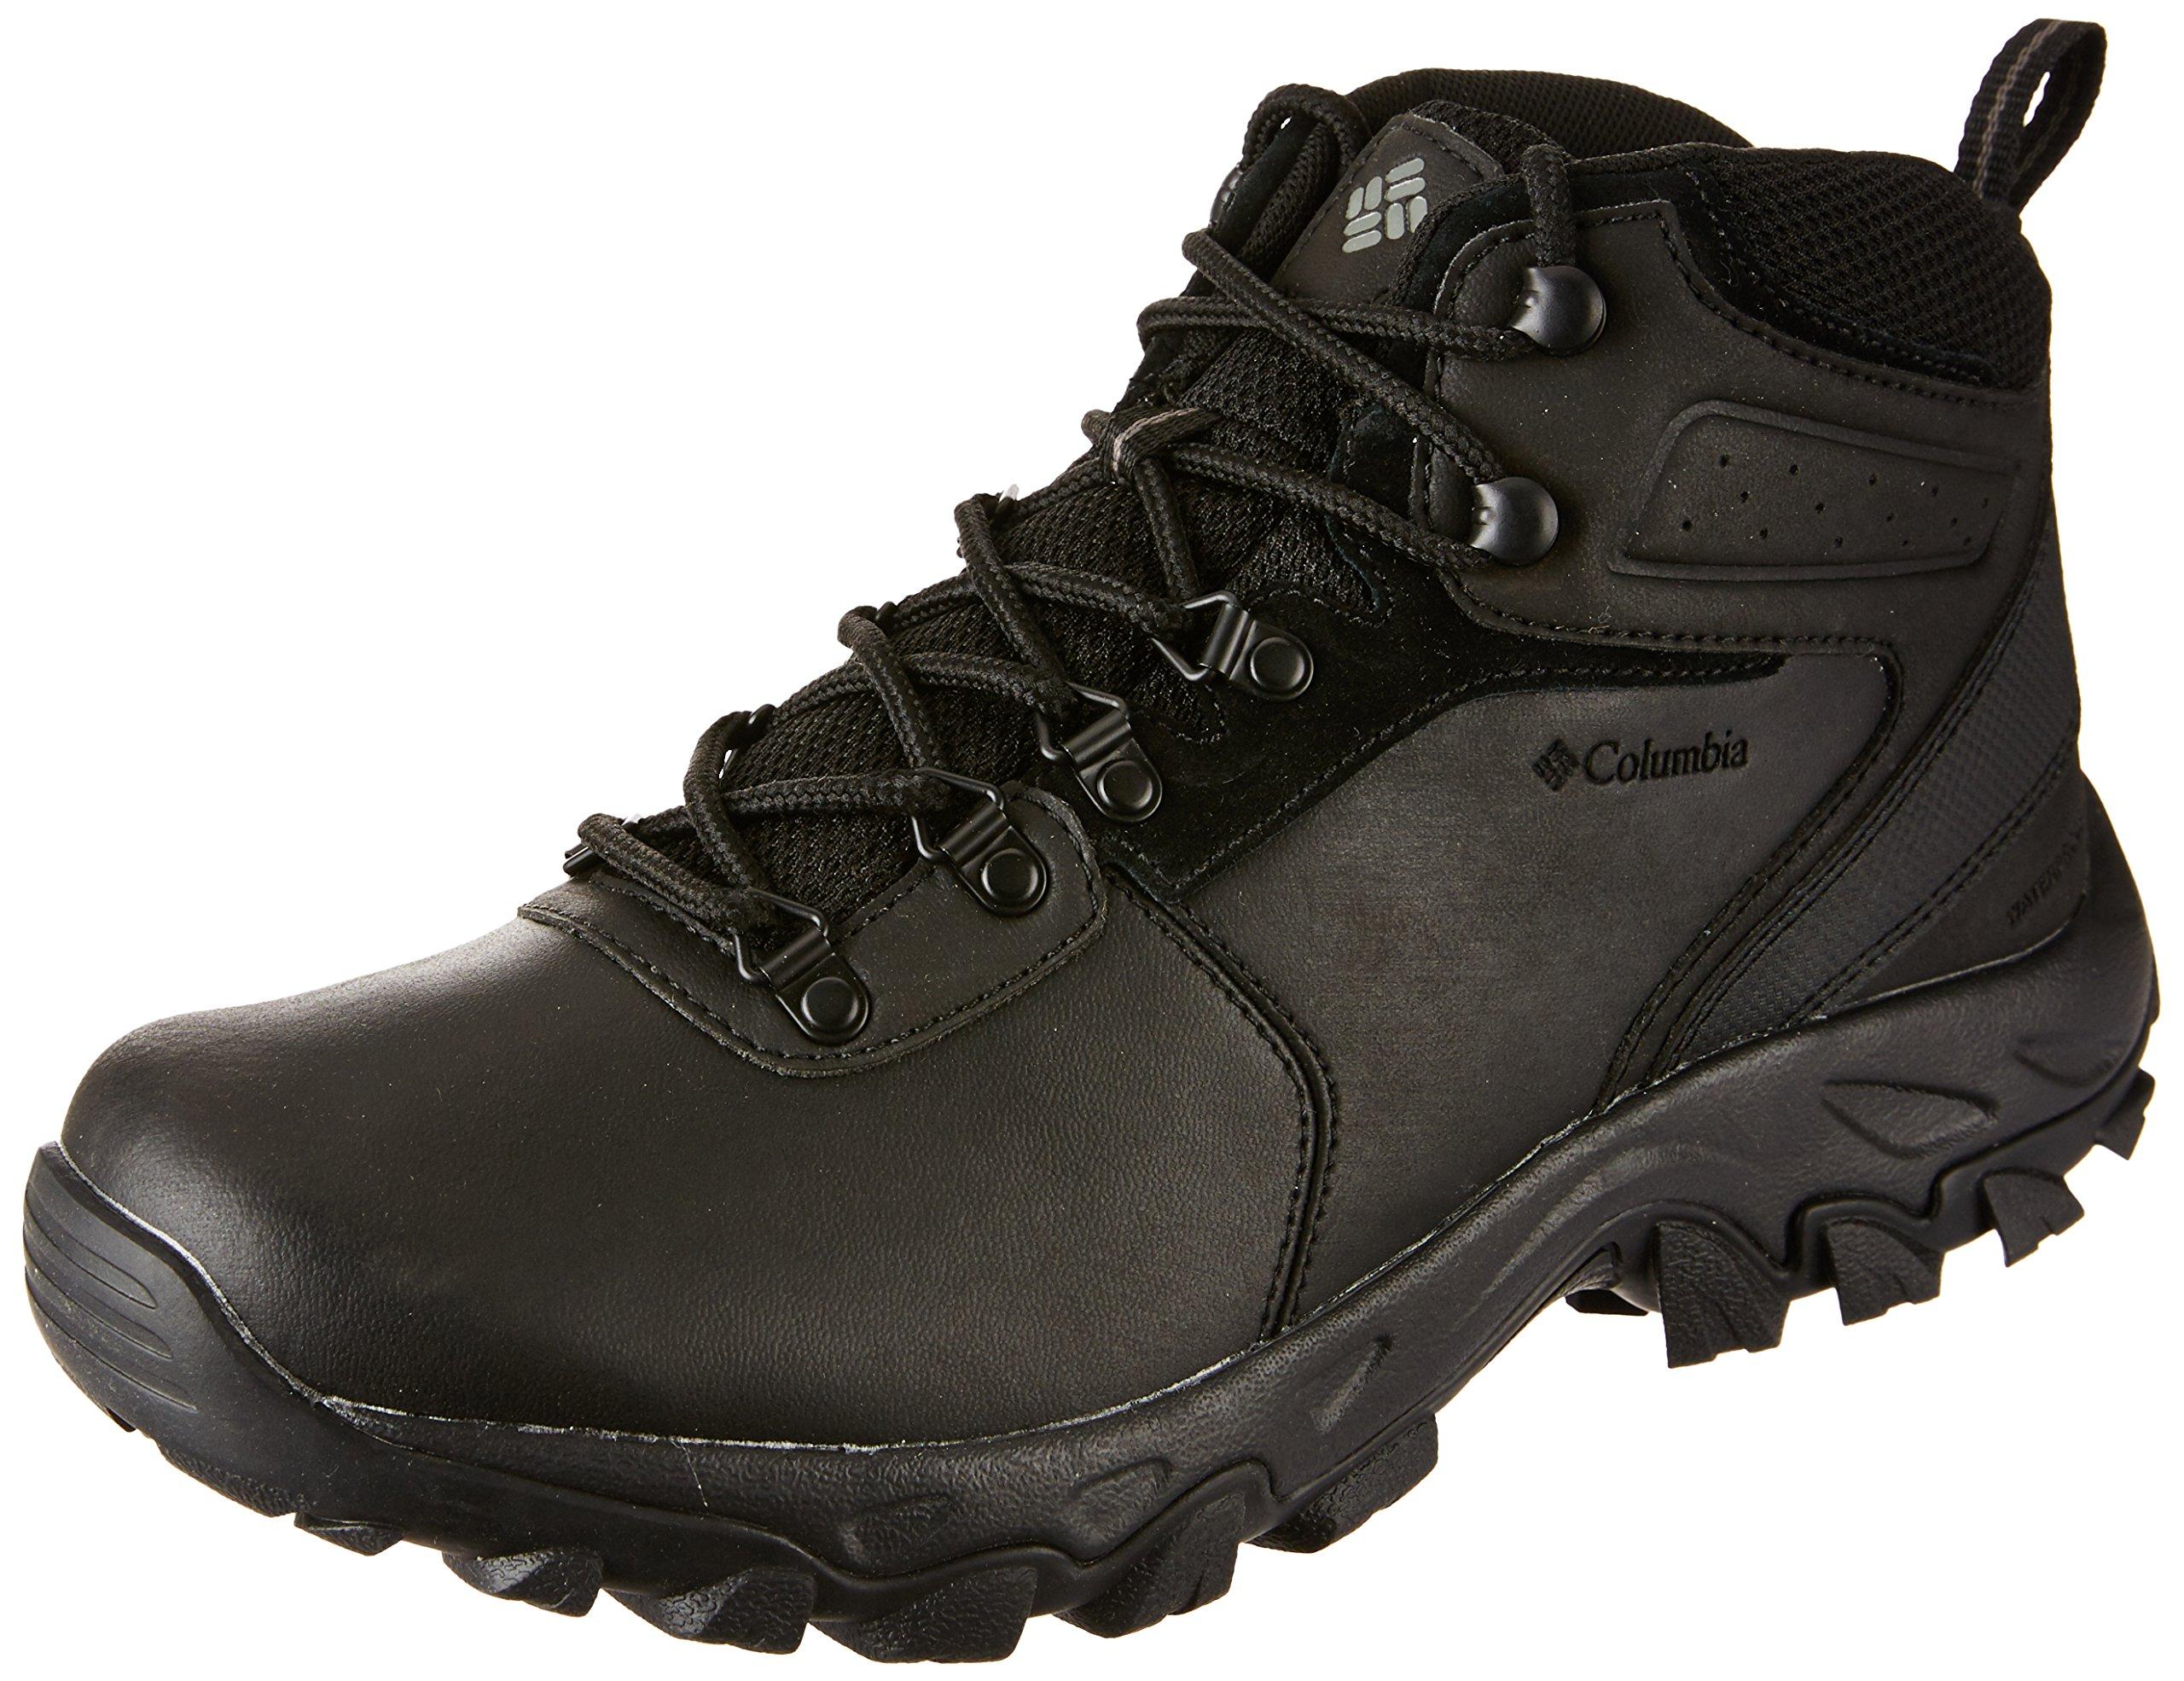 Columbia Men's Newton Ridge Plus II Waterproof Hiking Boot, Black/Black, 12 D US